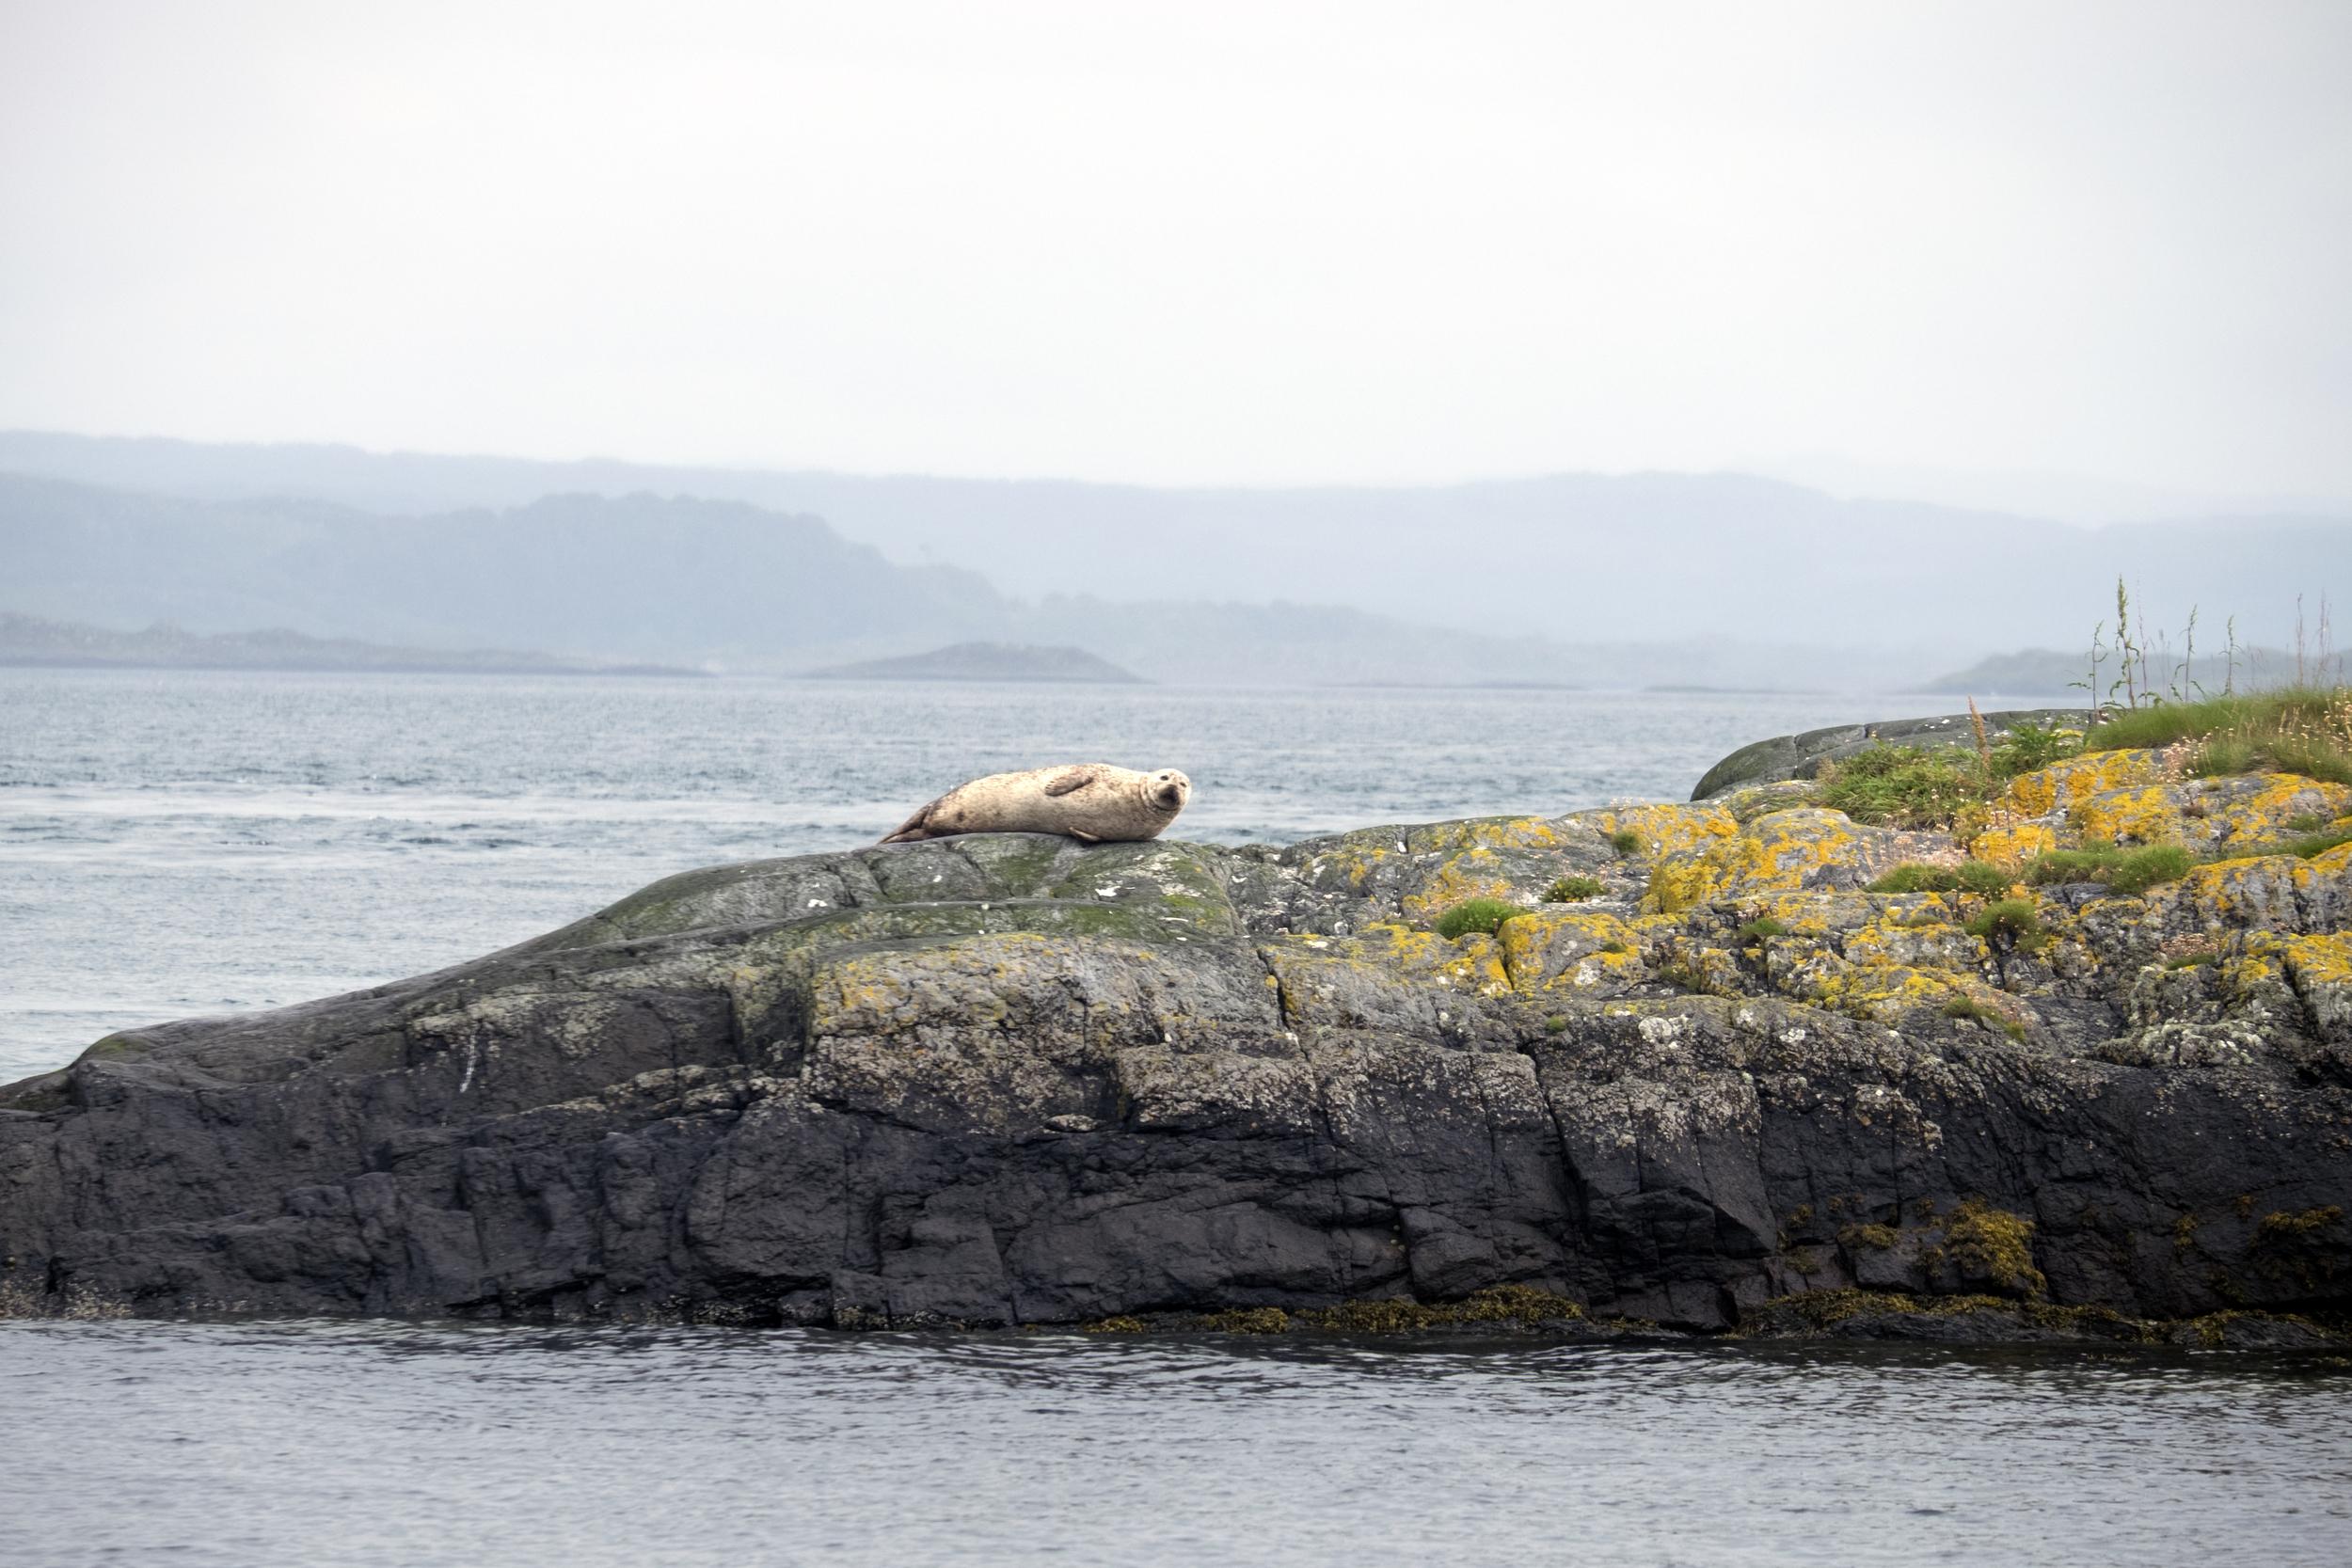 20150727 Seal on the rocks (1).jpg